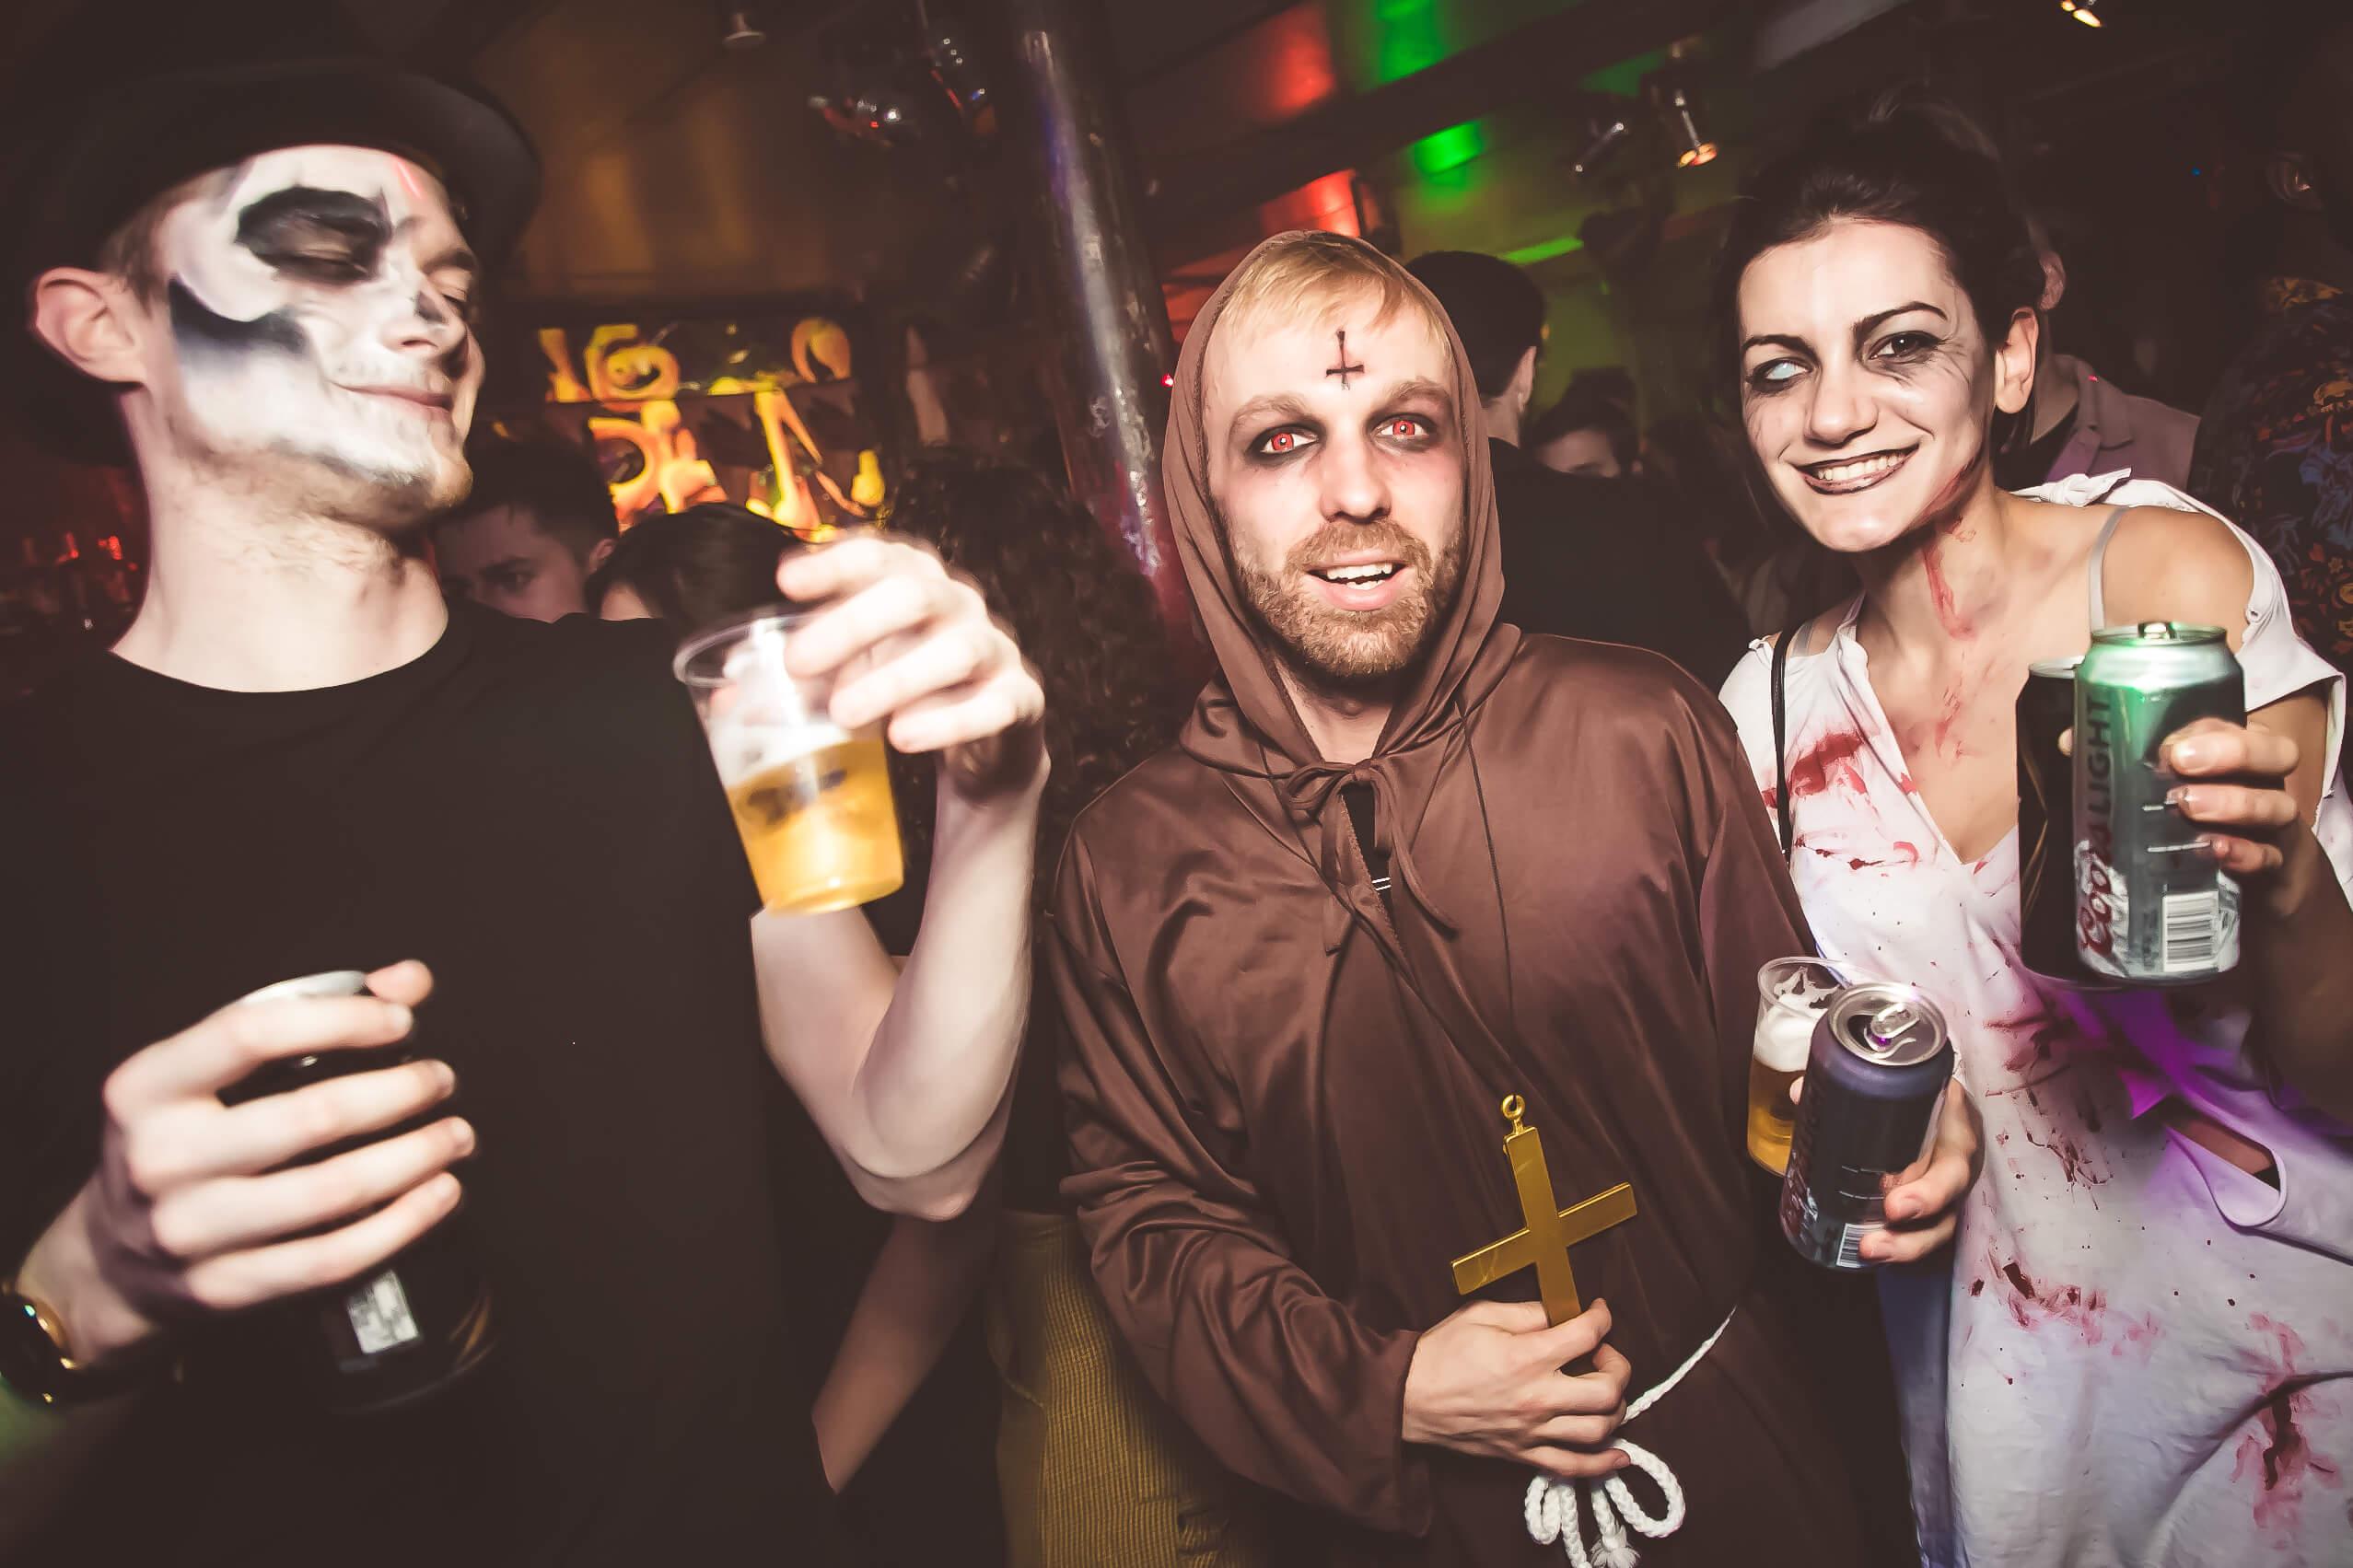 Haunted LDN: London's Biggest Halloween Party